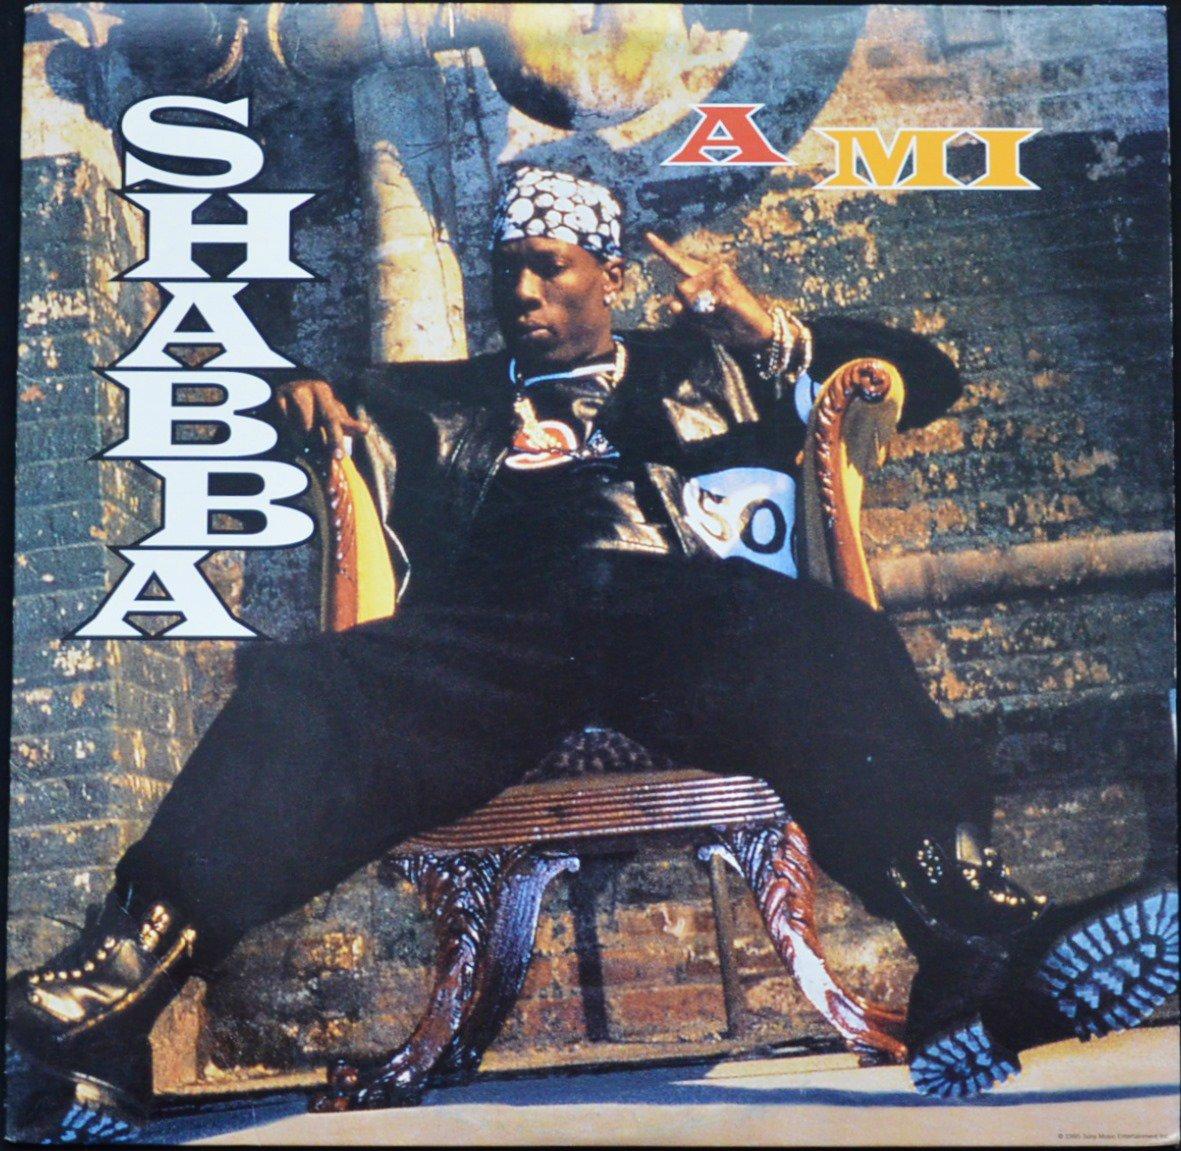 SHABBA RANKS / A MI SHABBA (1LP)